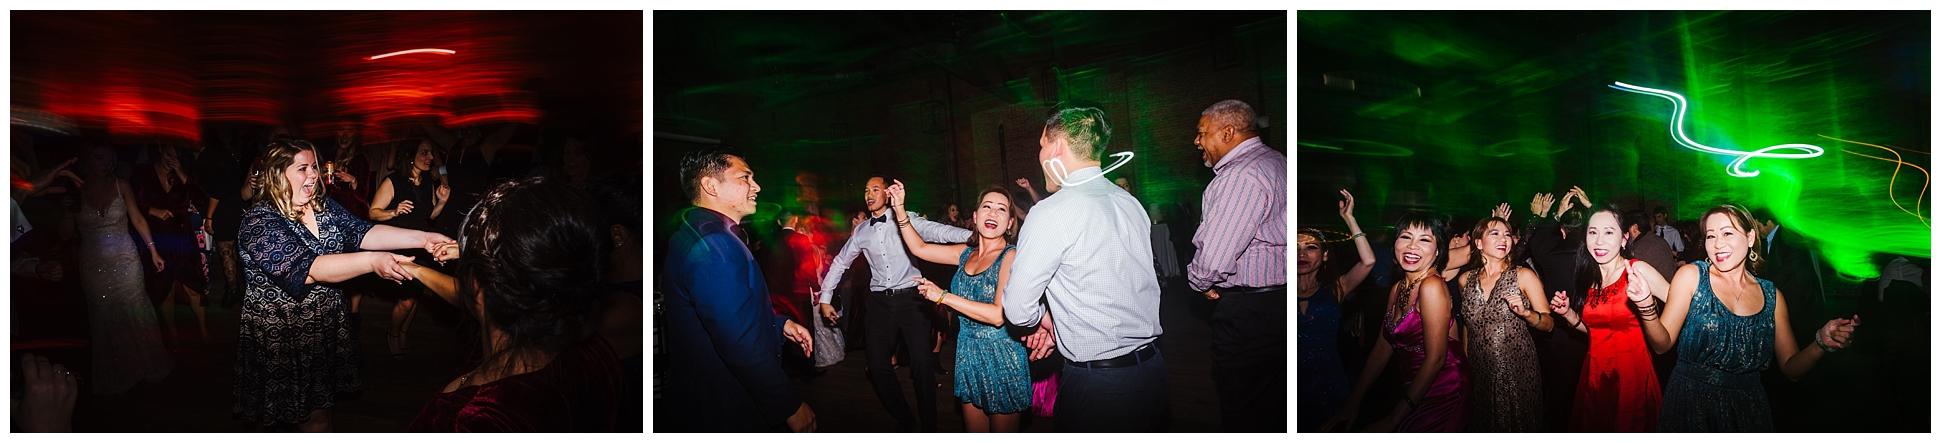 tampa-armeture-wedding-photographer-edgy-industrial-downtown-fancy-free-nursery-tattoo-burgandy-velvet_0084.jpg